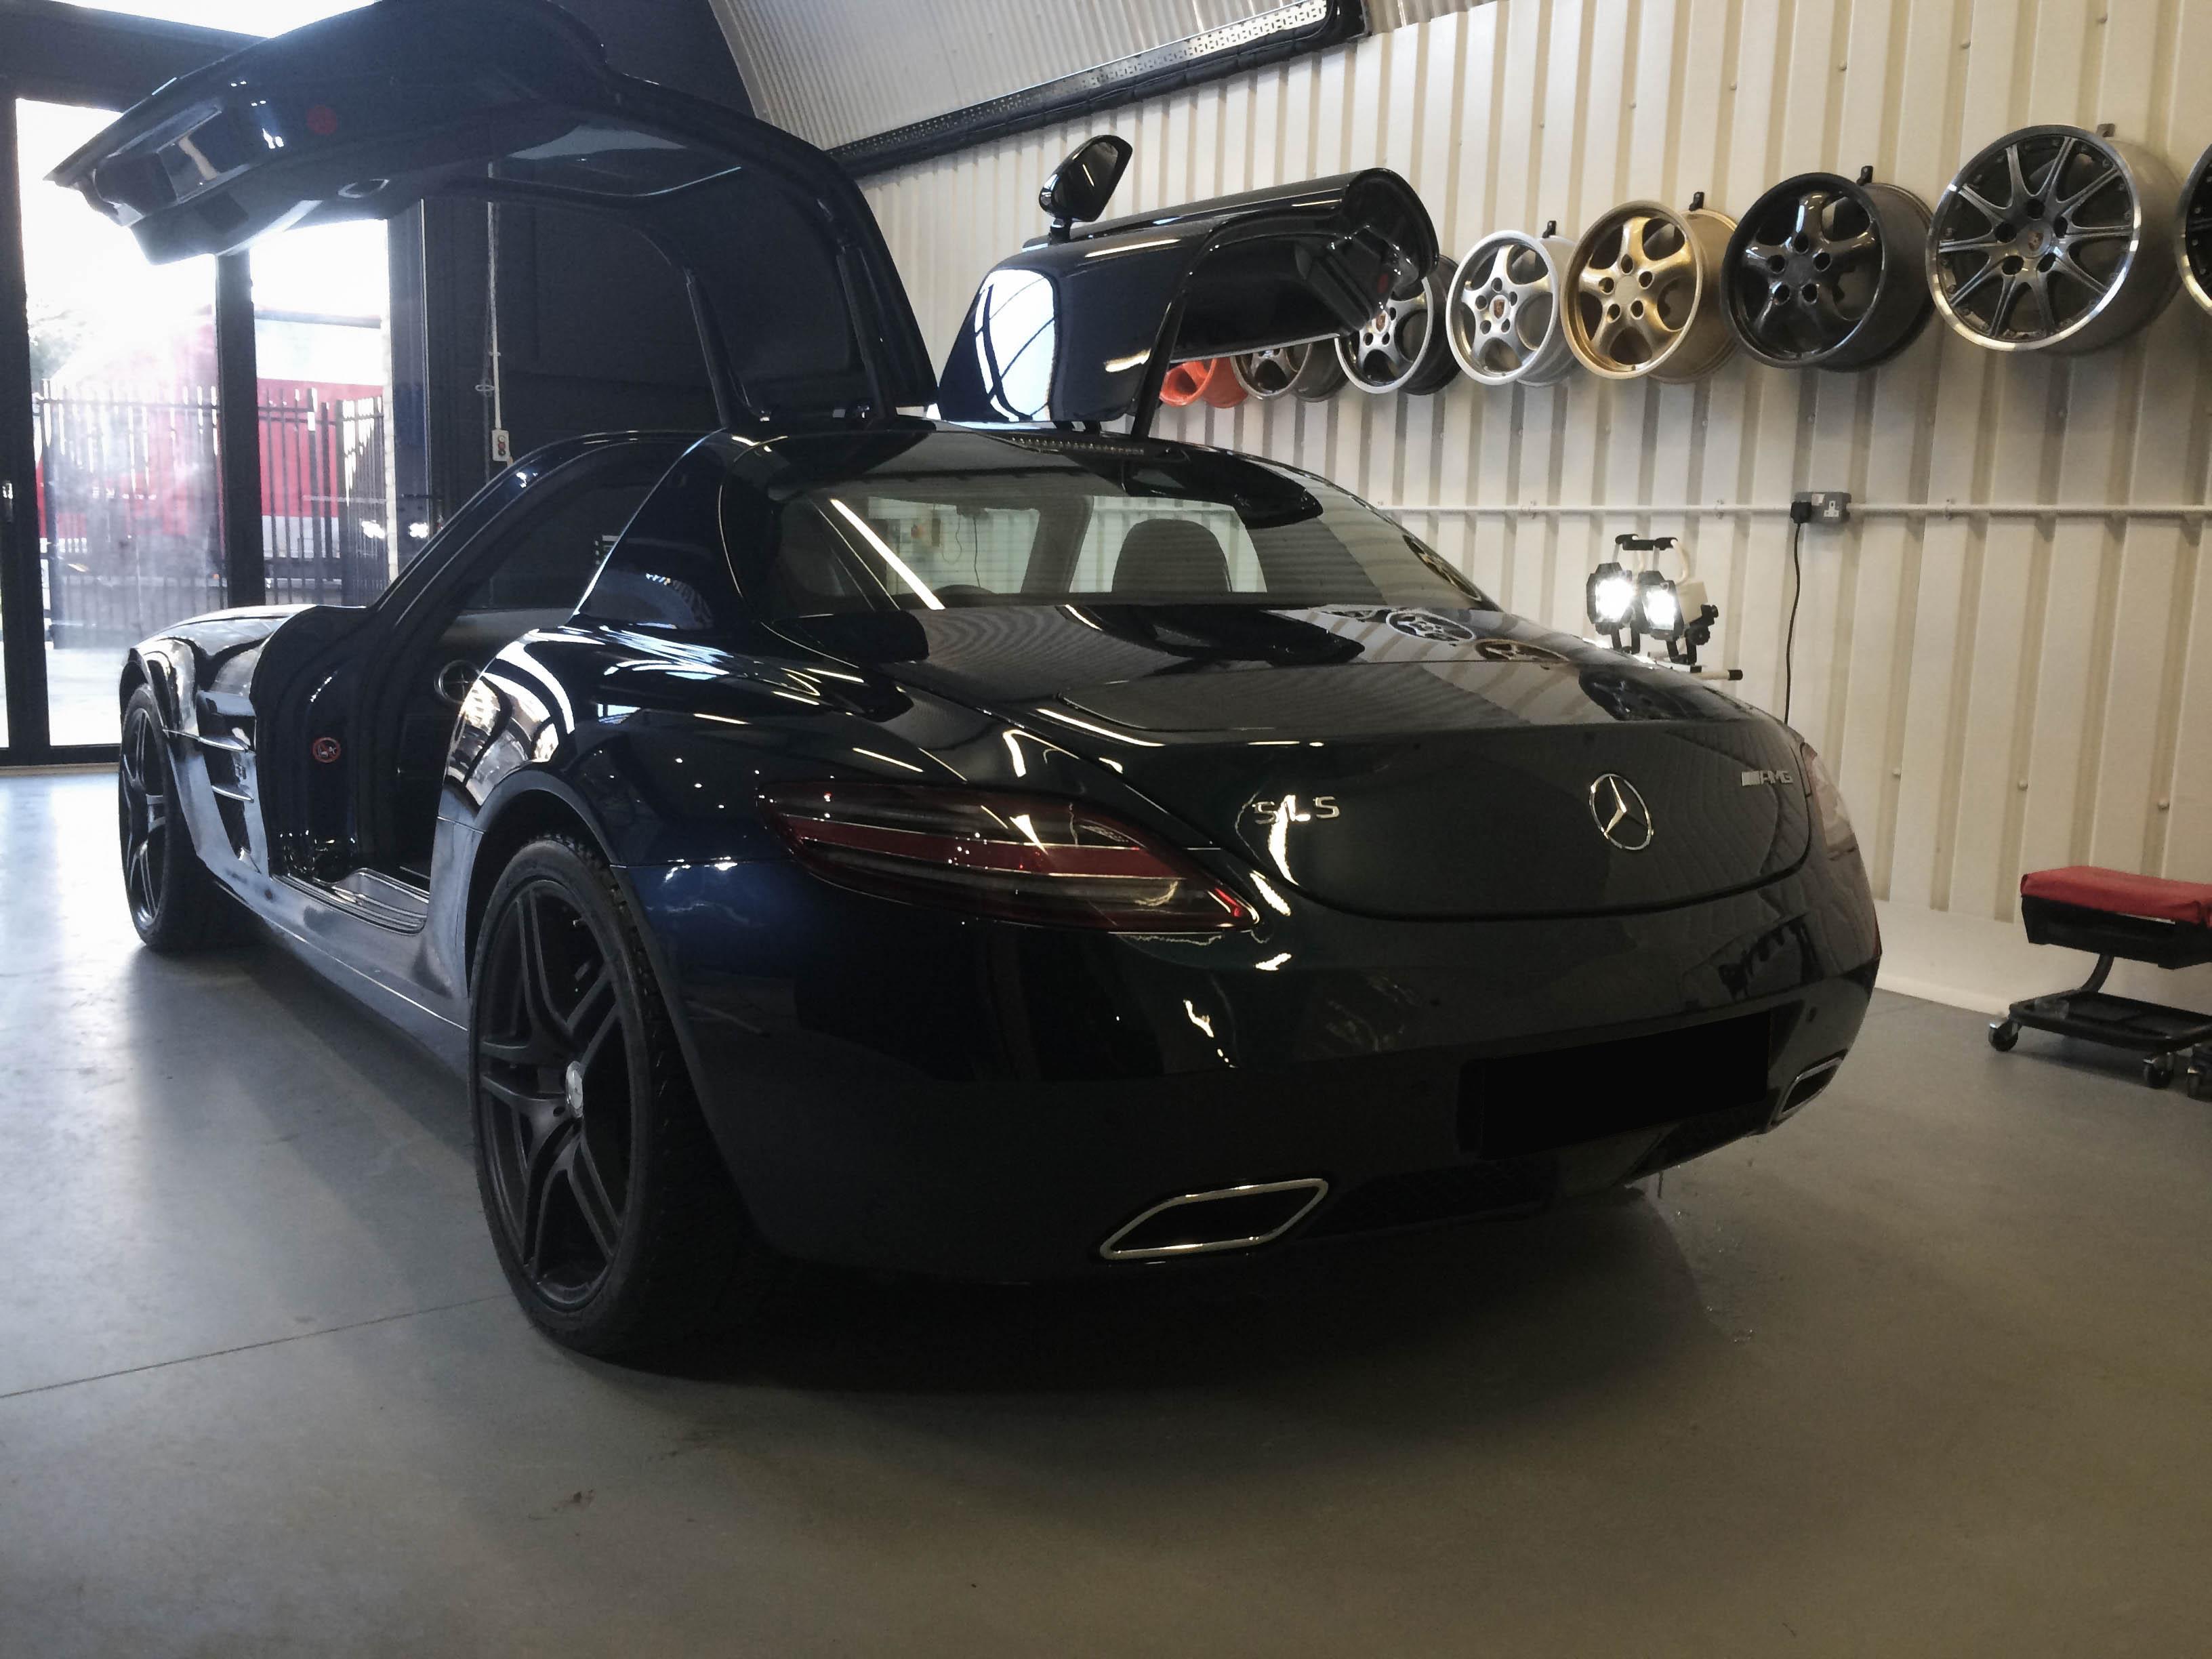 Mercedes SLS AMG –Rear